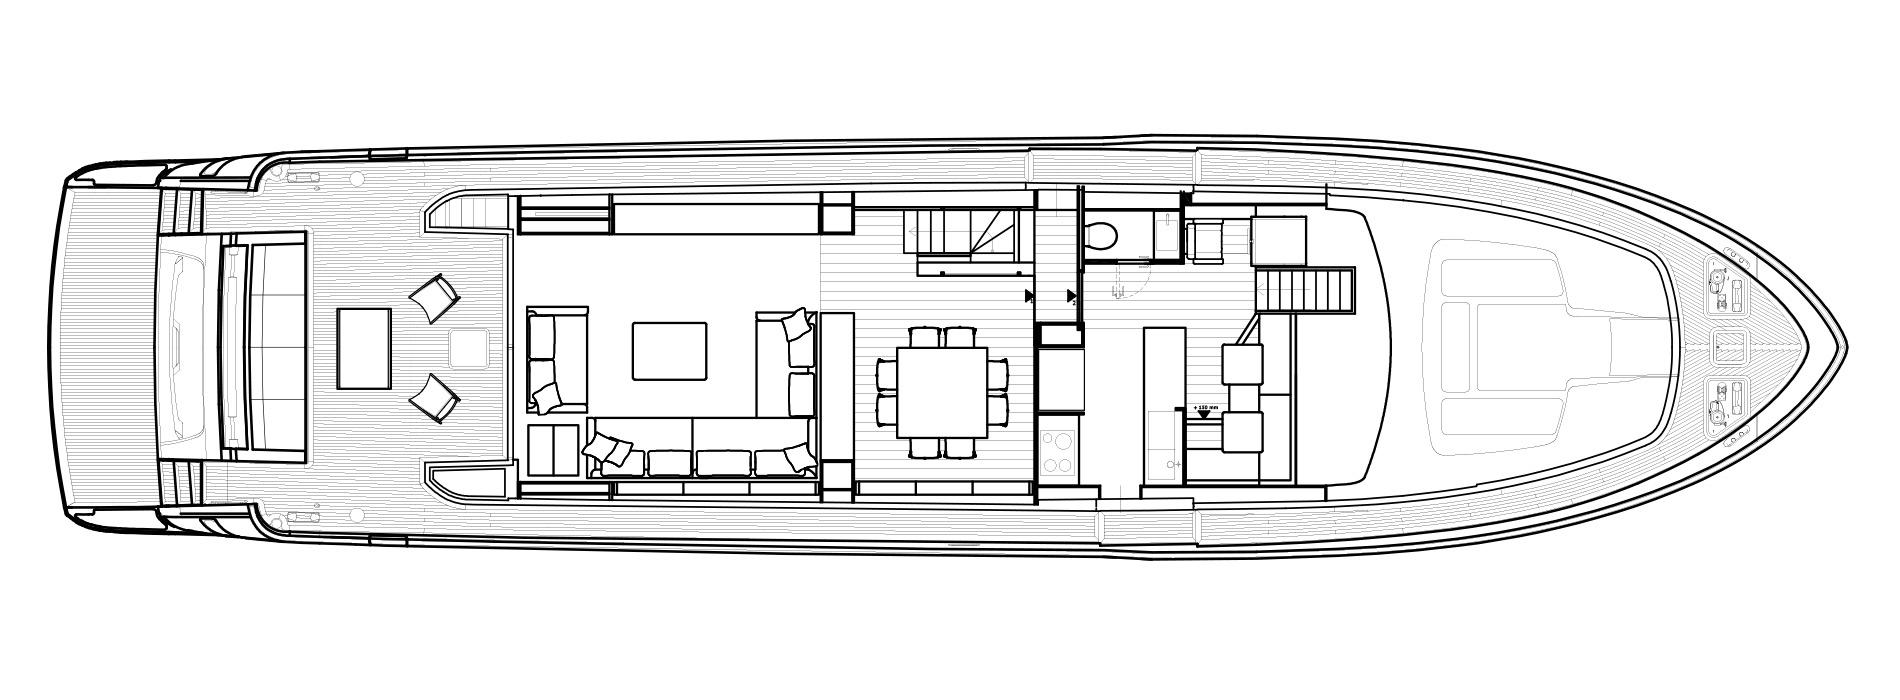 Sanlorenzo Yachts SL86/698 Главная палуба версия USA